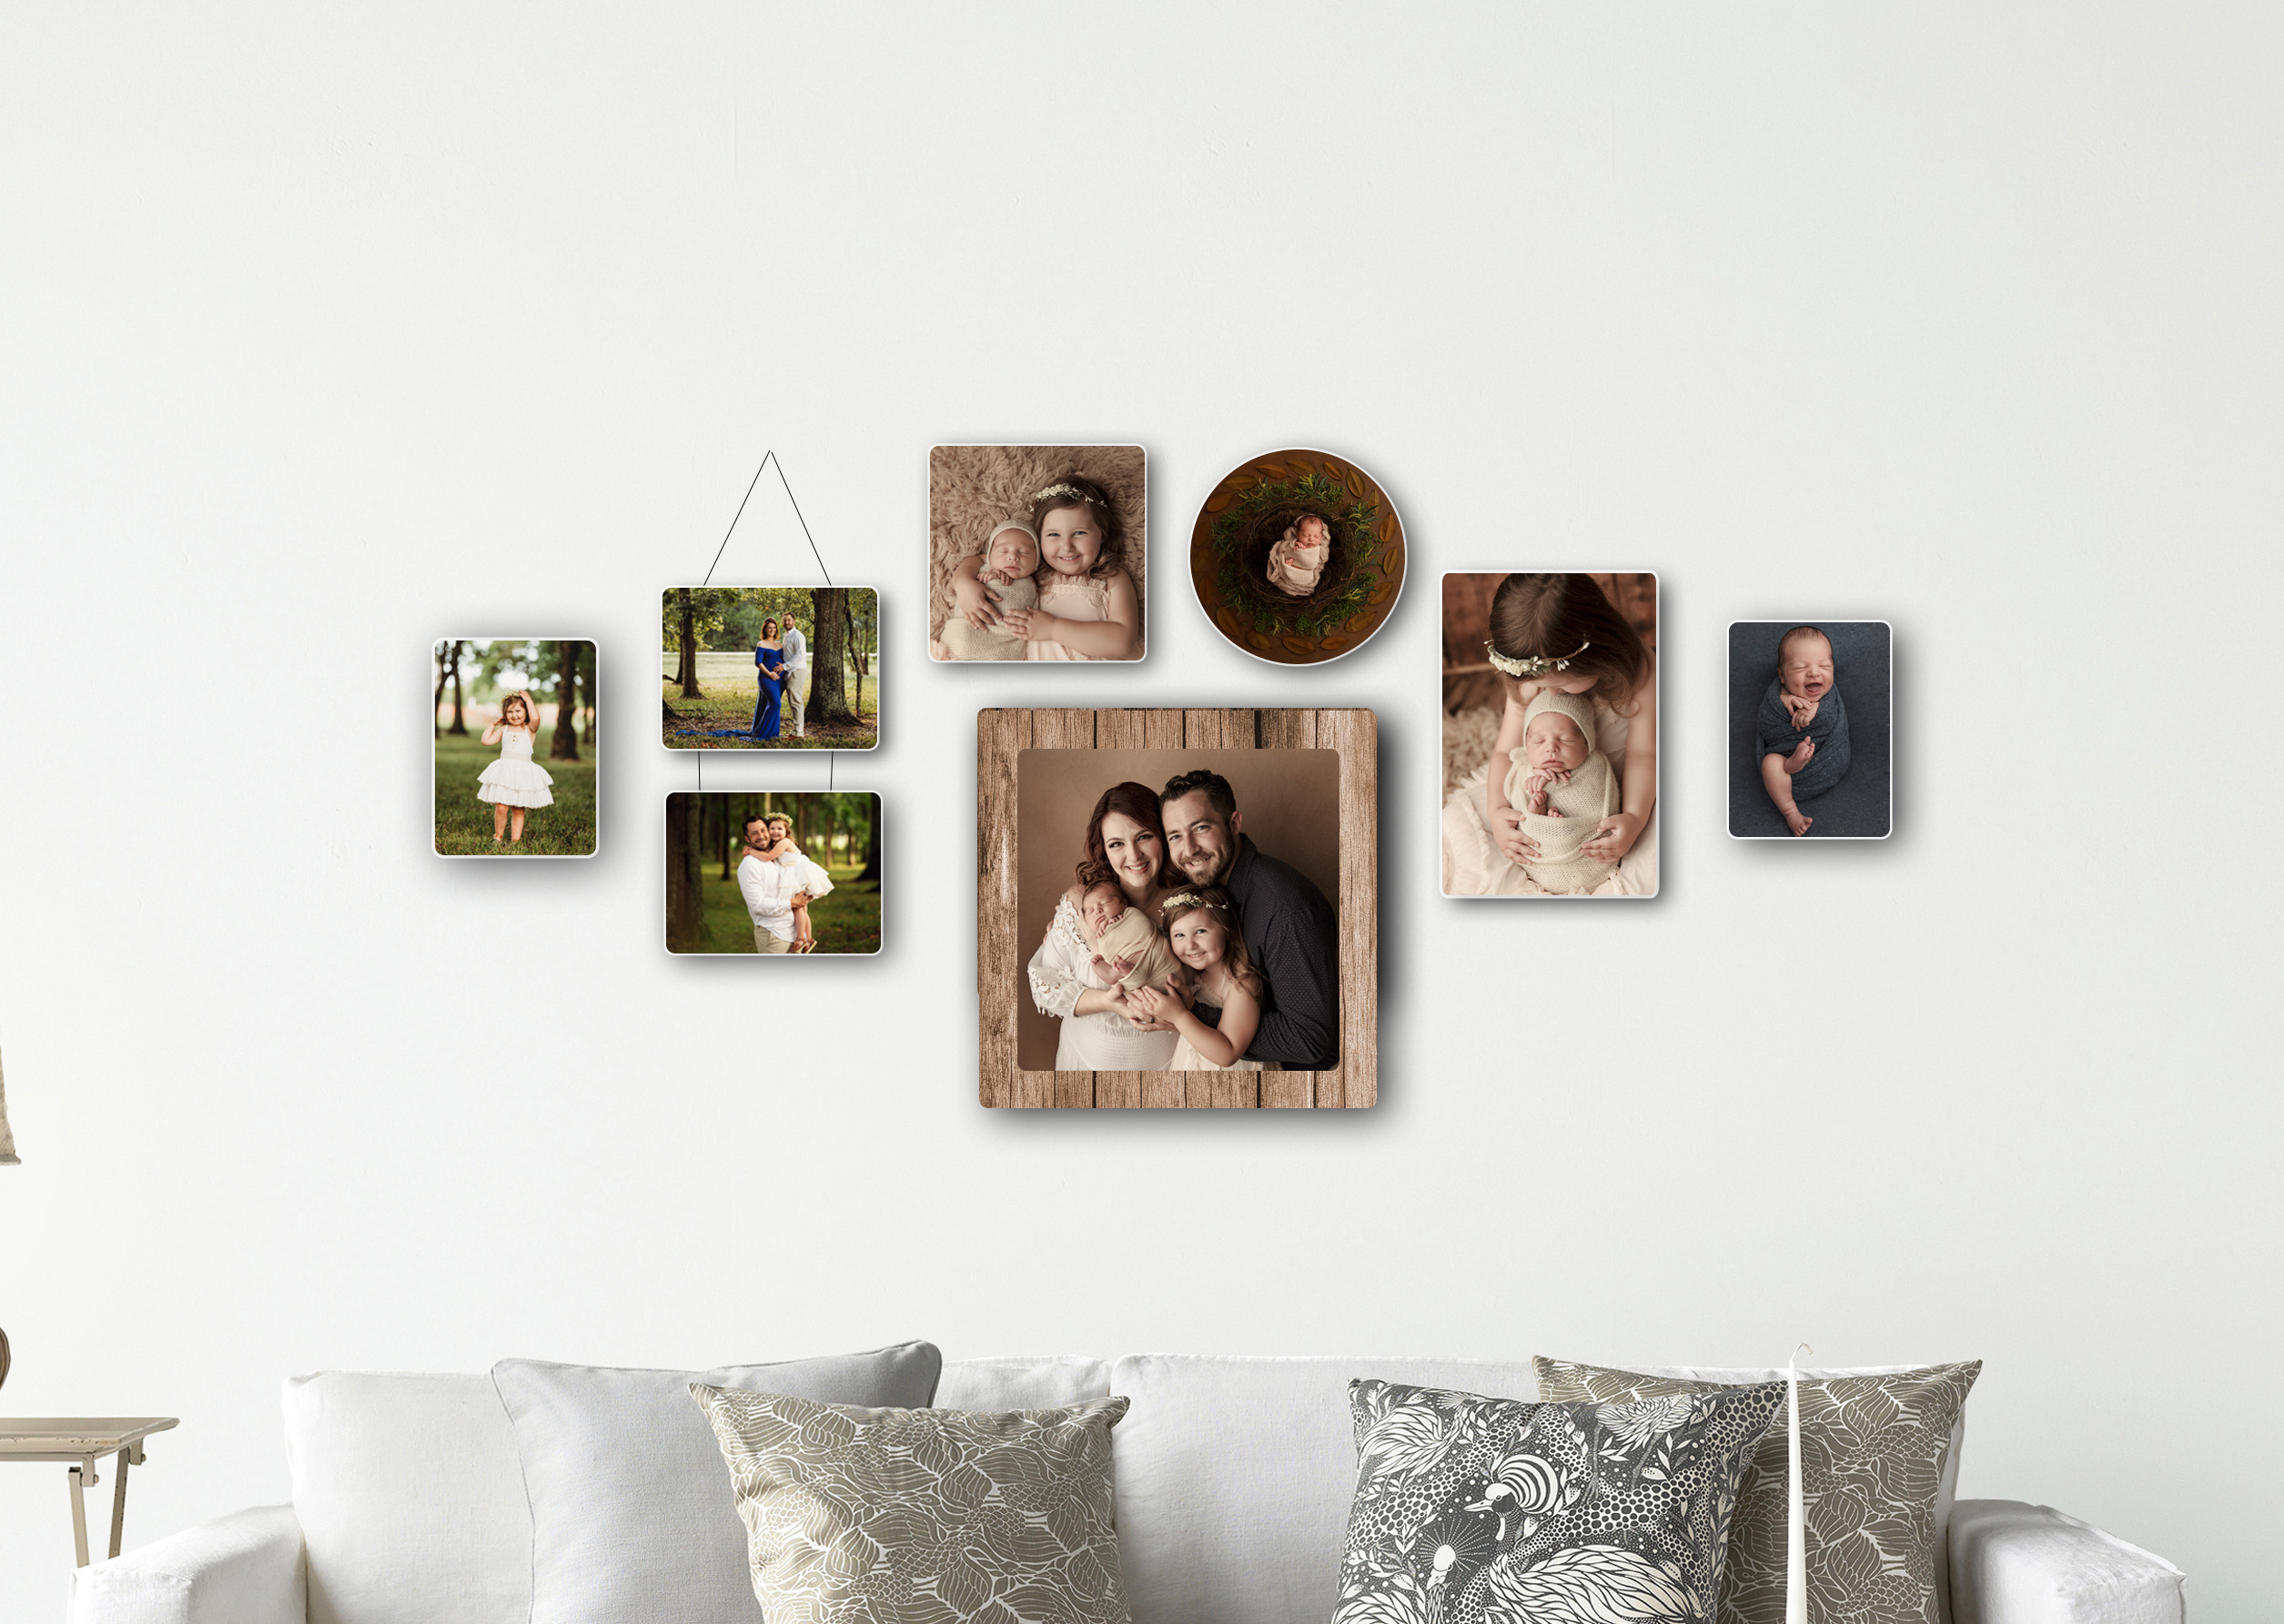 Imported Wood Blocks- Professional portrait photographer in Katy